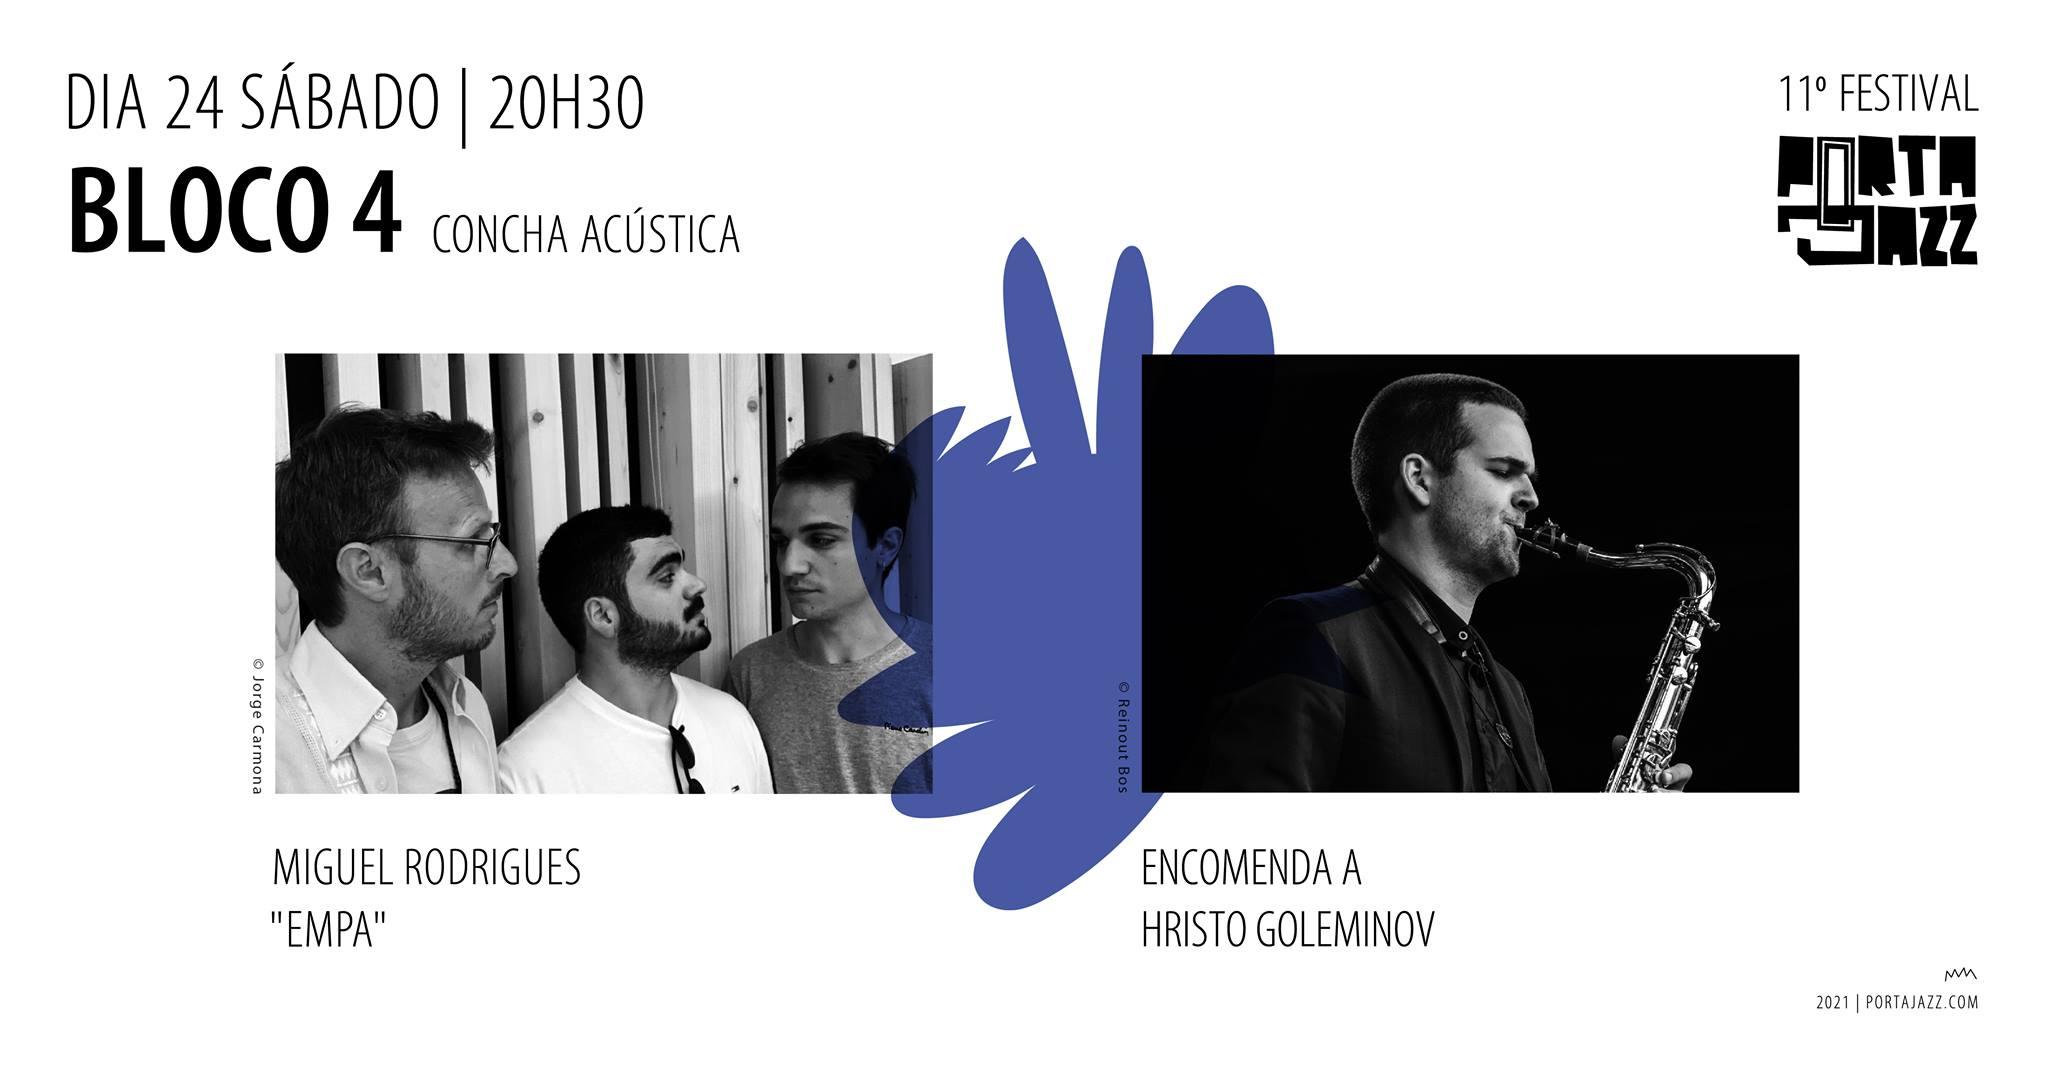 11º Festival Porta-Jazz    Bloco 4   Miguel Rodrigues 'Empa' + Encomenda a Hristo Goleminov